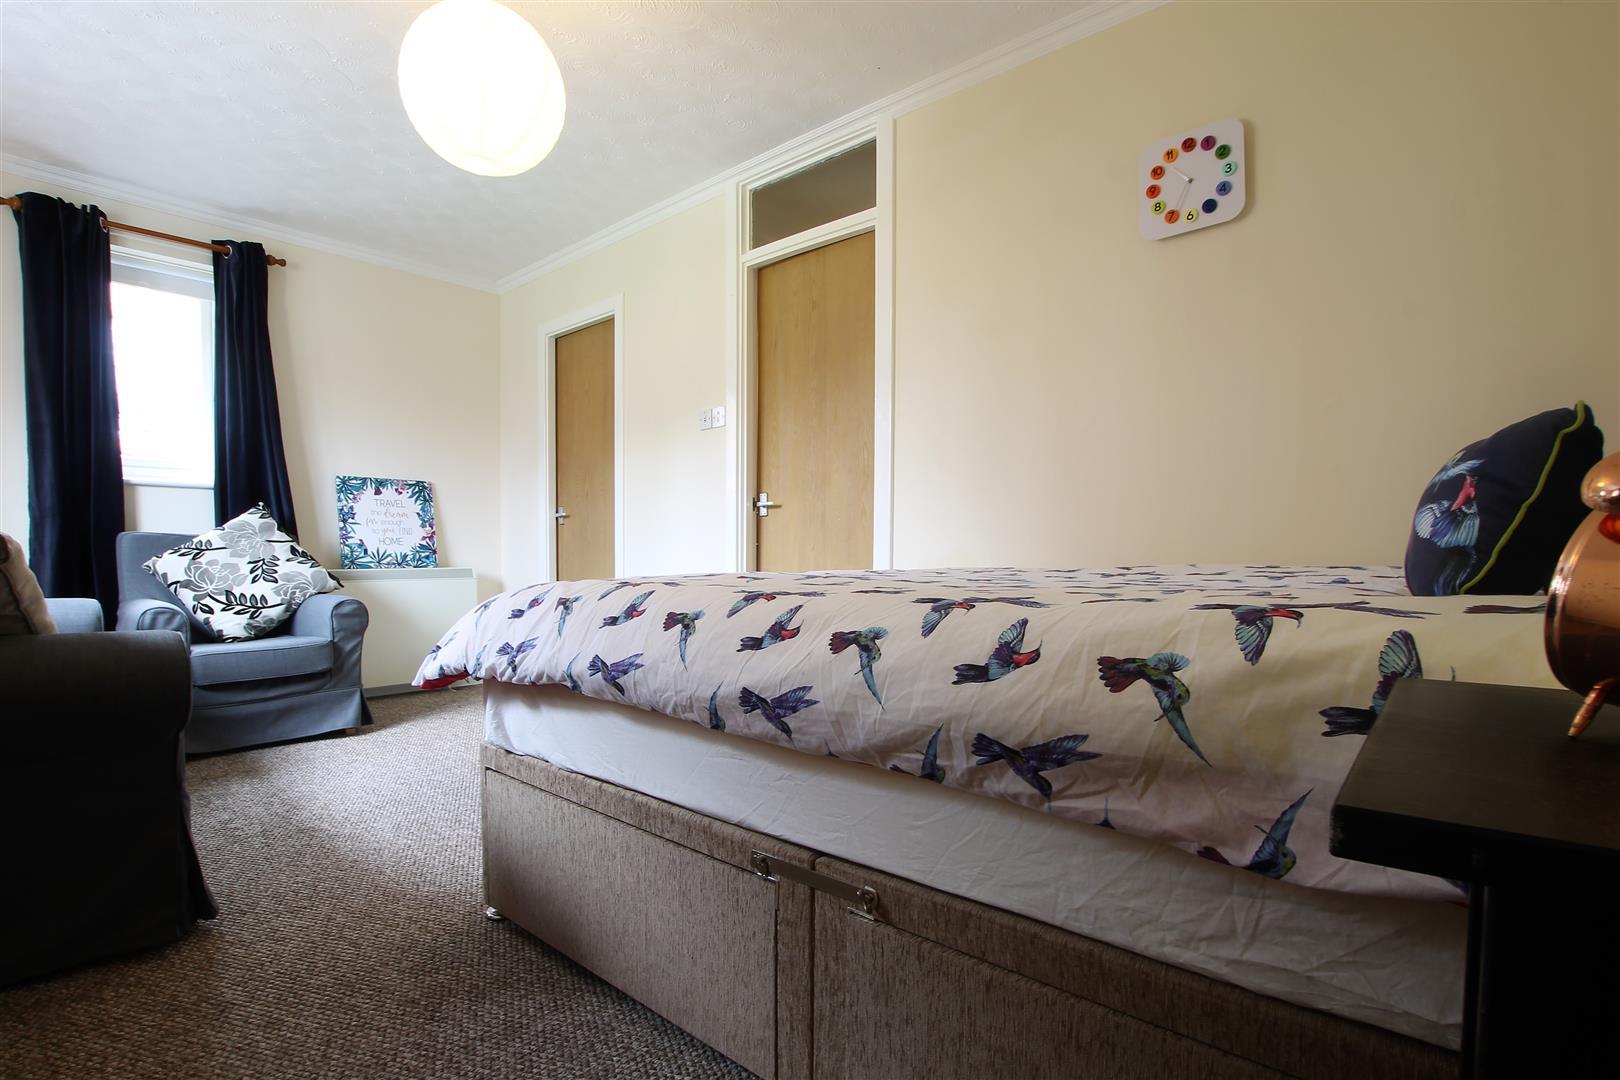 Blackfriars Court. Newcastle Upon Tyne, 1 Bedrooms  Studio ,To Let